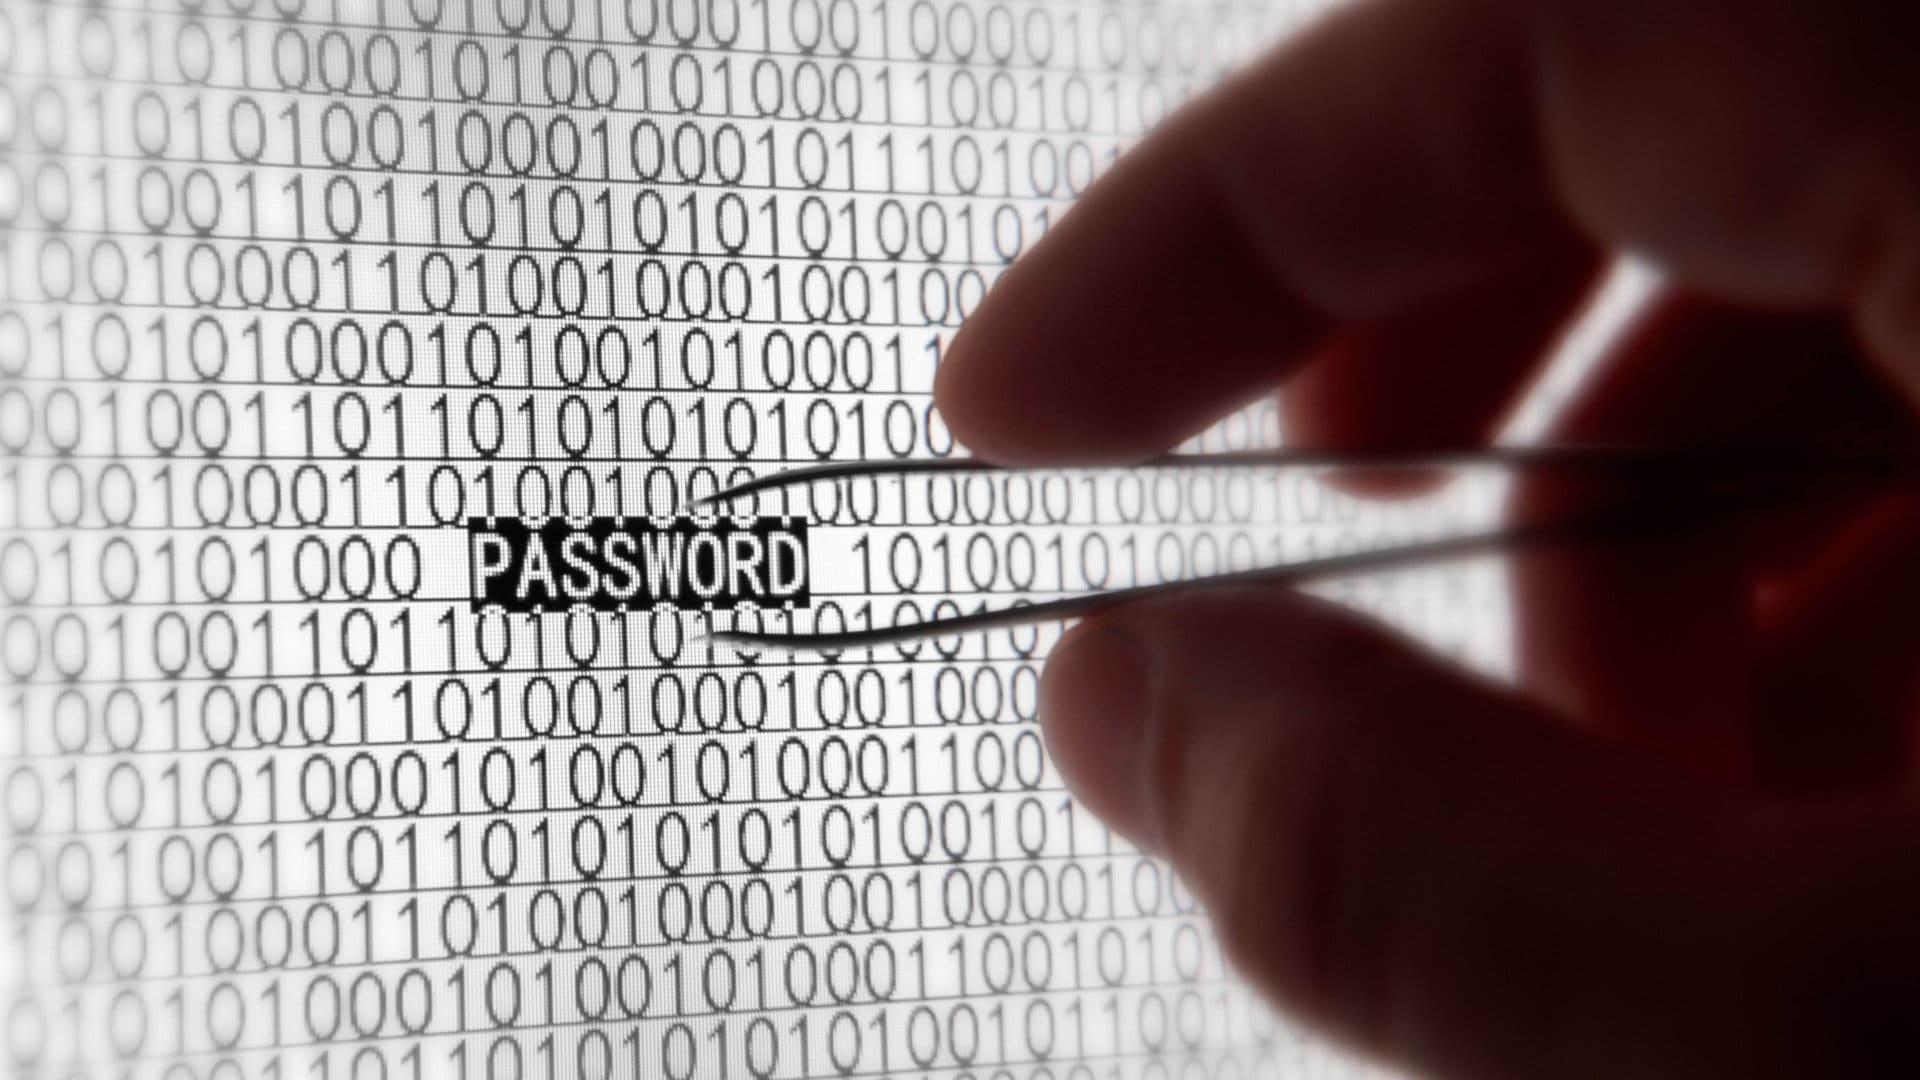 5 Methods to Generate a Random Password from the Command Line - Putorius